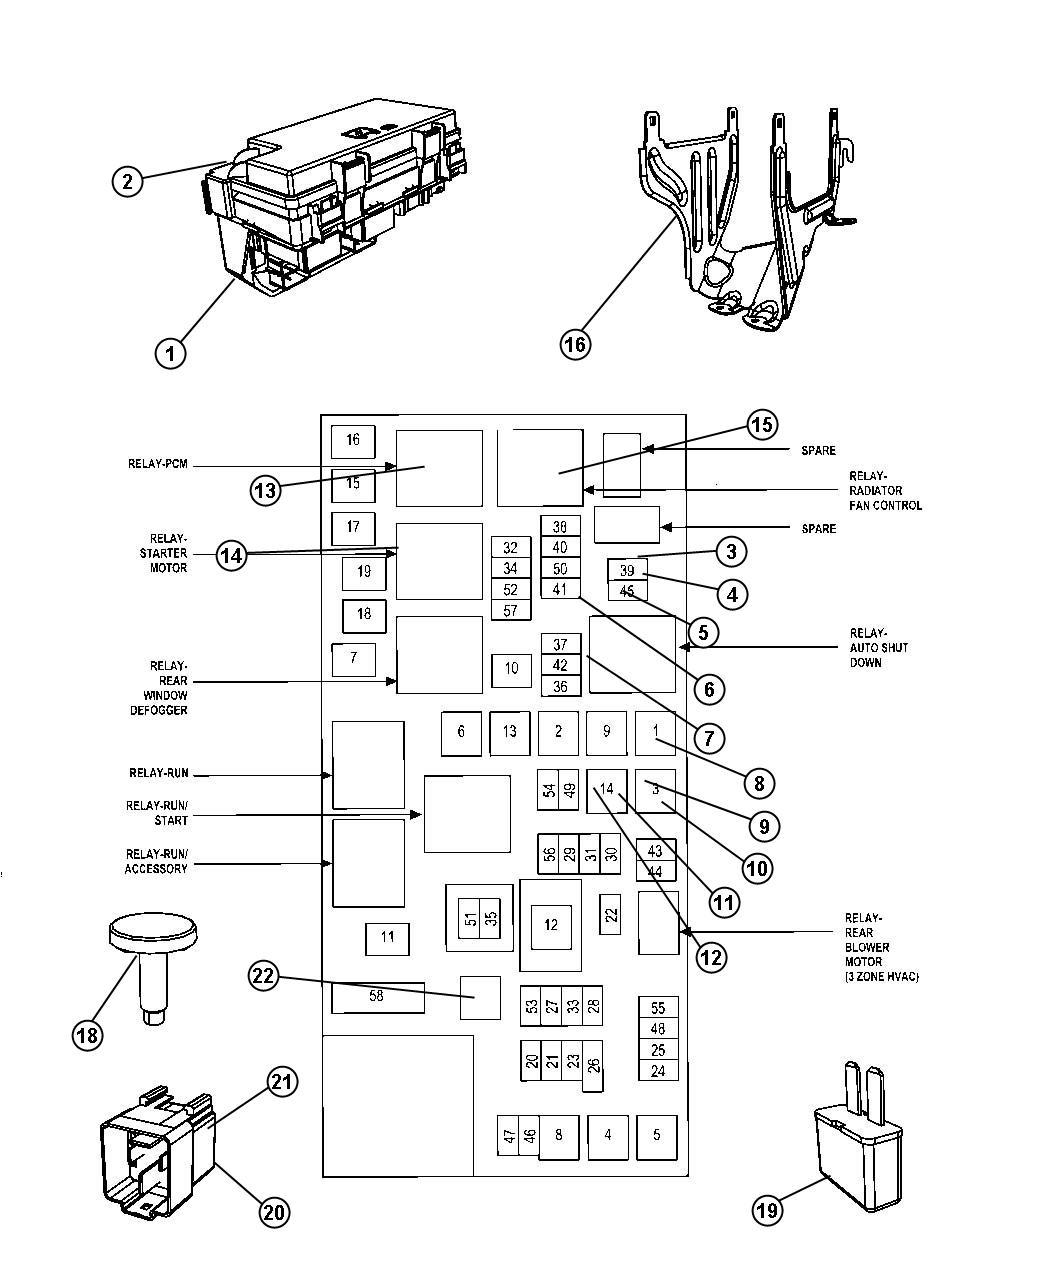 94 Dodge Ram Factory Radio Wiring Diagram 68105507ad Chrysler Module Totally Integrated Power